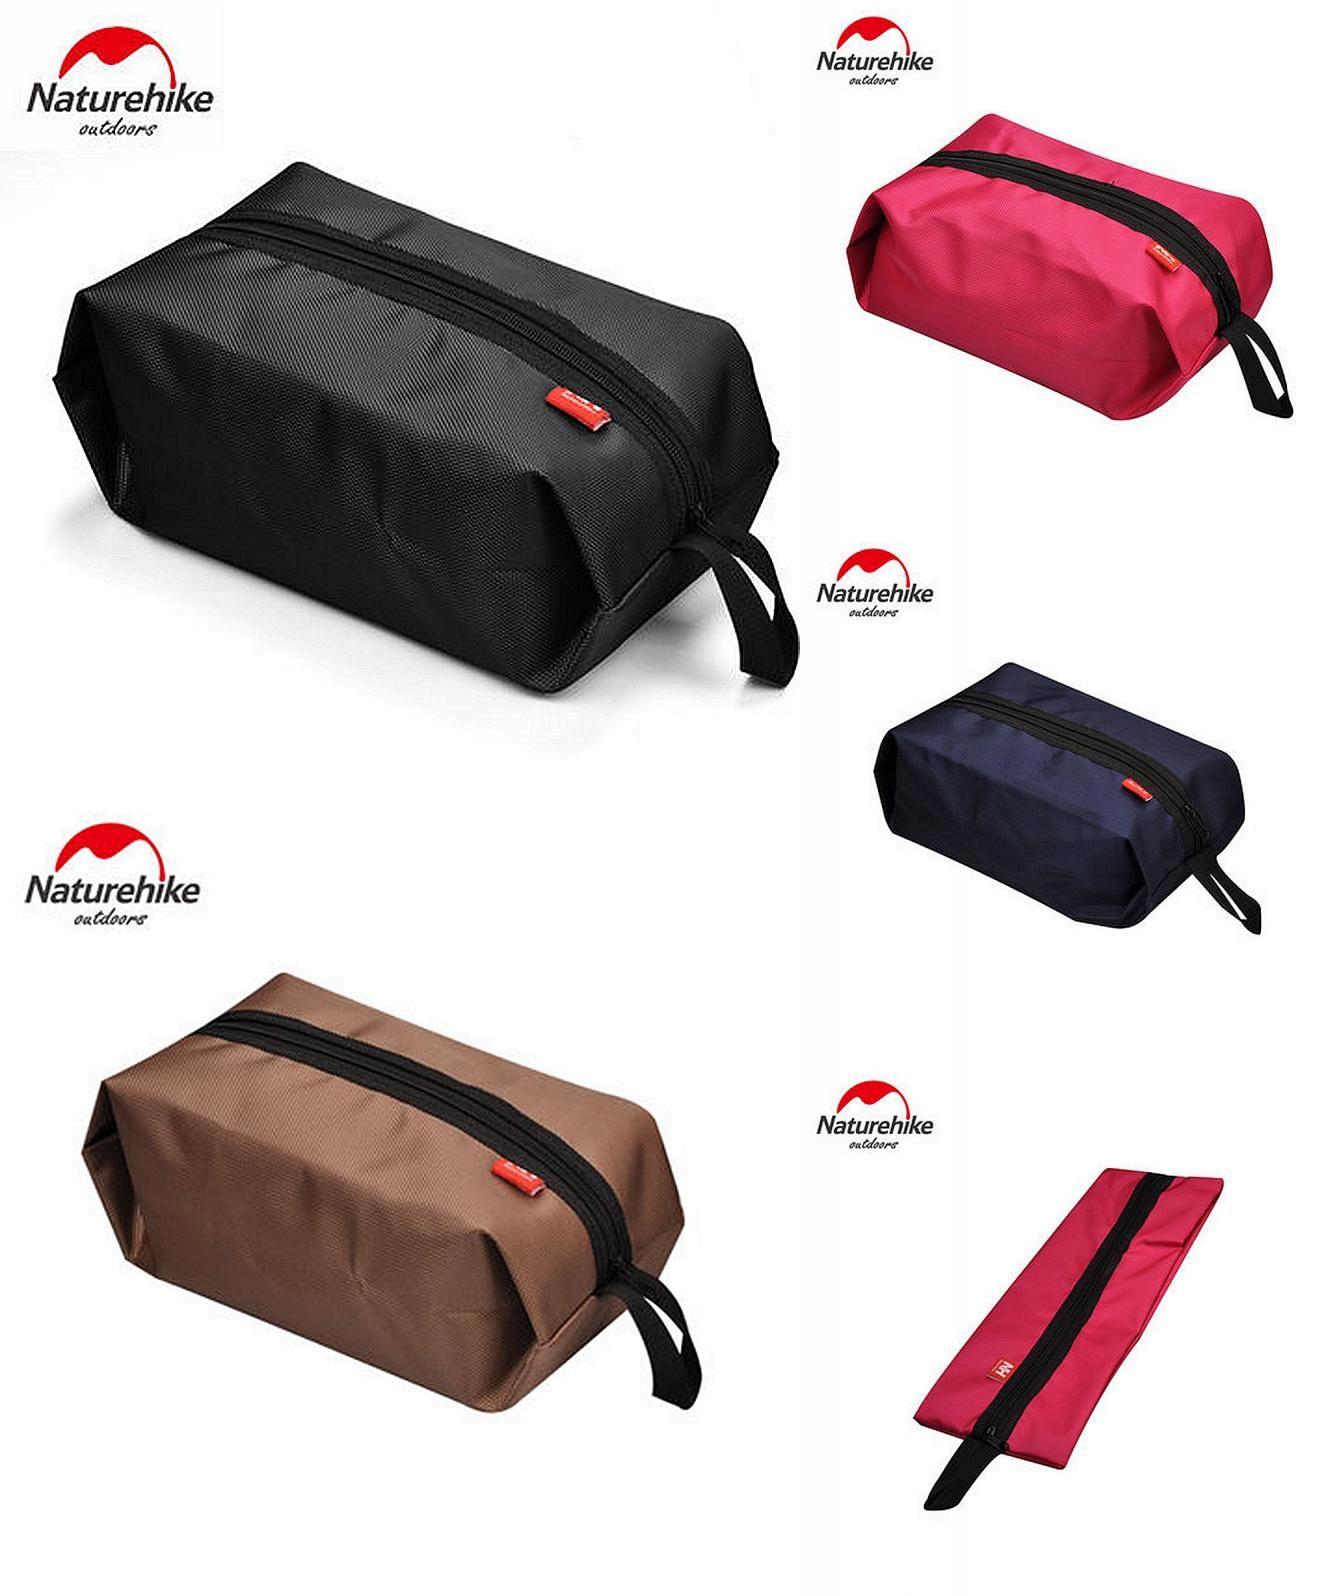 Travel Luggage Duffle Bag Lightweight Portable Handbag Fish Underwater Large Capacity Waterproof Foldable Storage Tote